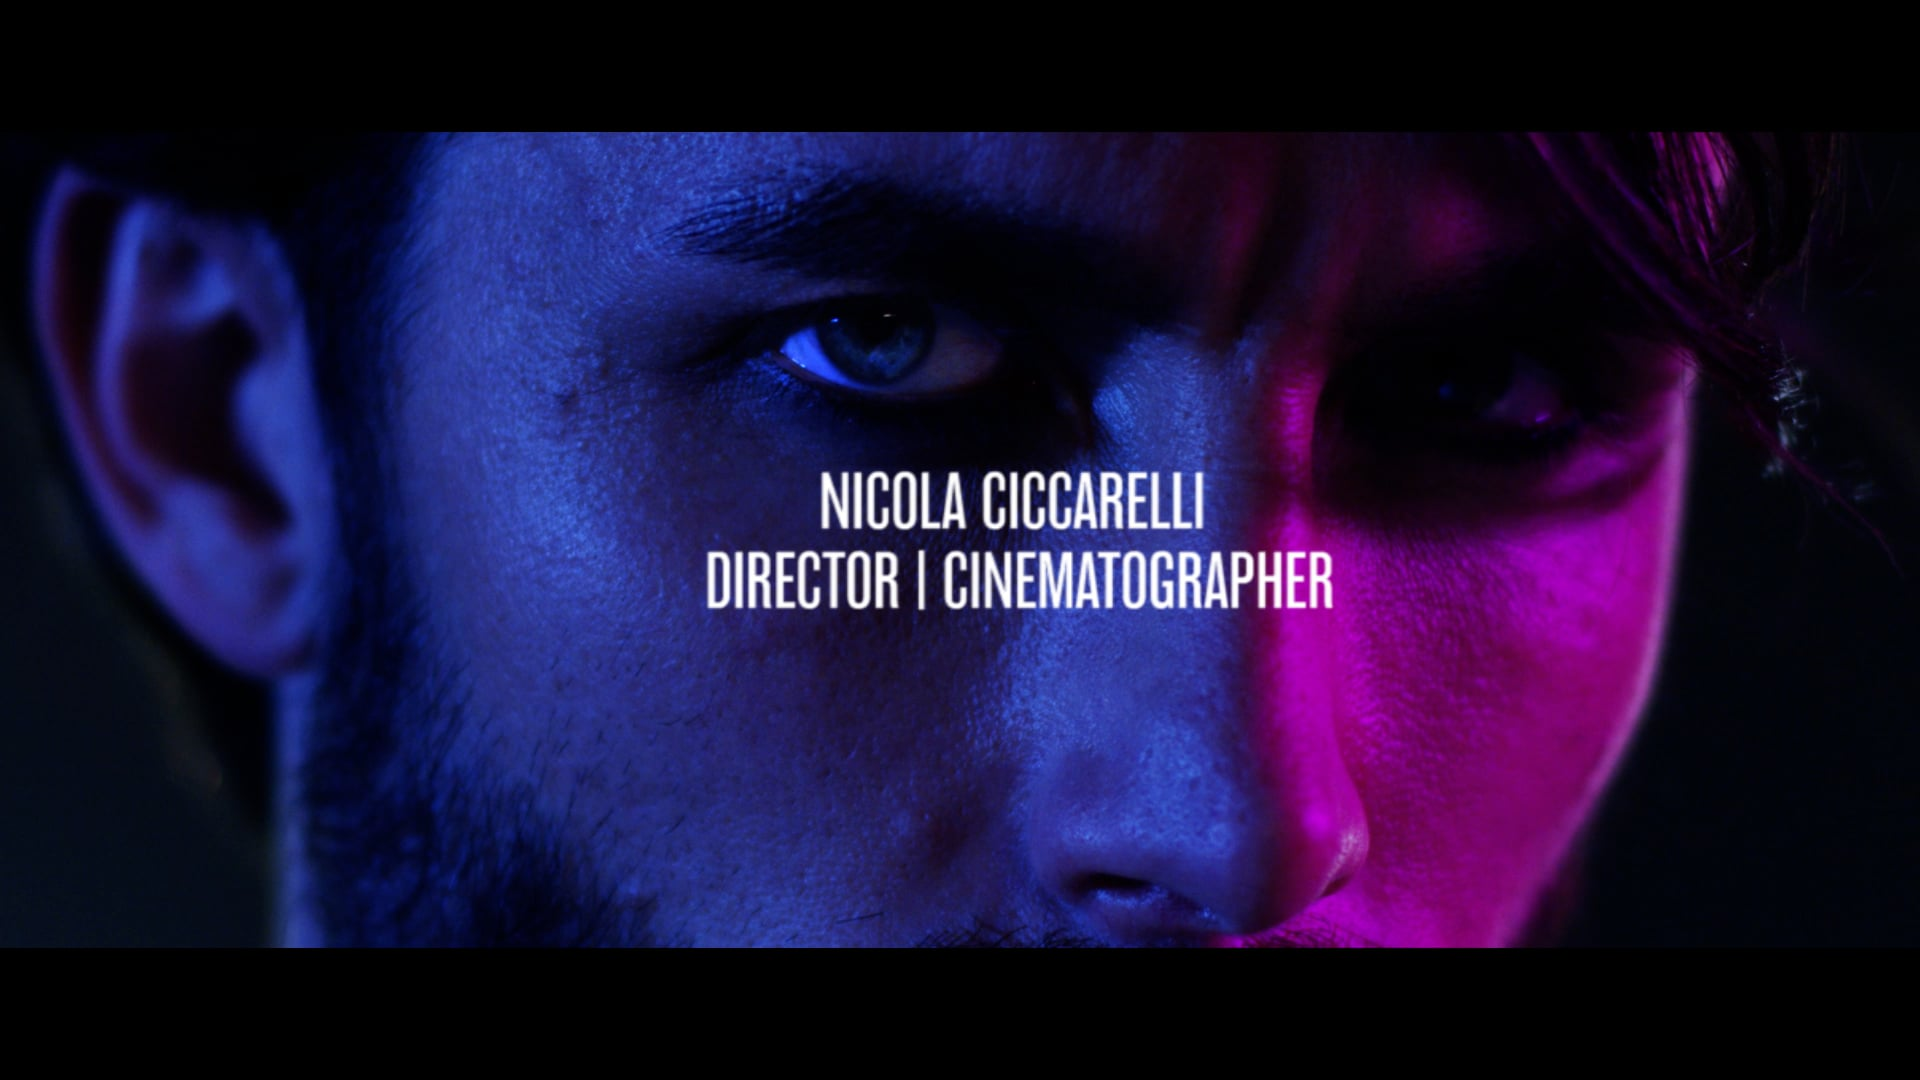 Nicola_Ciccarelli_Director|Cinematographer